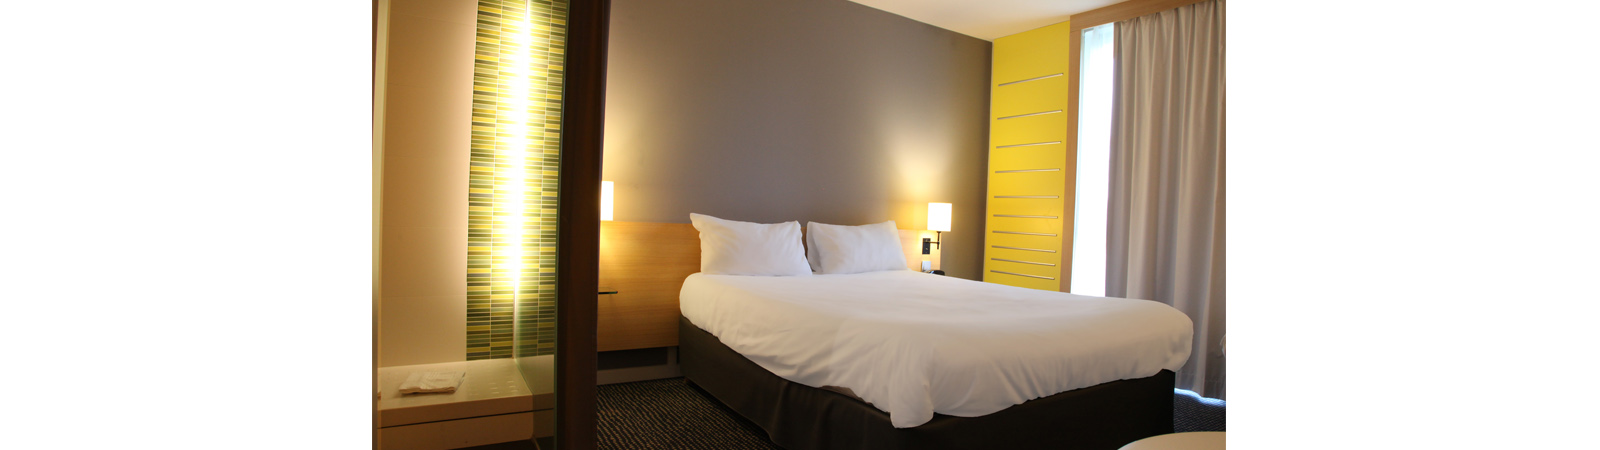 hotel-ibis-styles-reze-nantes_0002_Hotel-Ibis-Styles-Reze-29-03-17-26